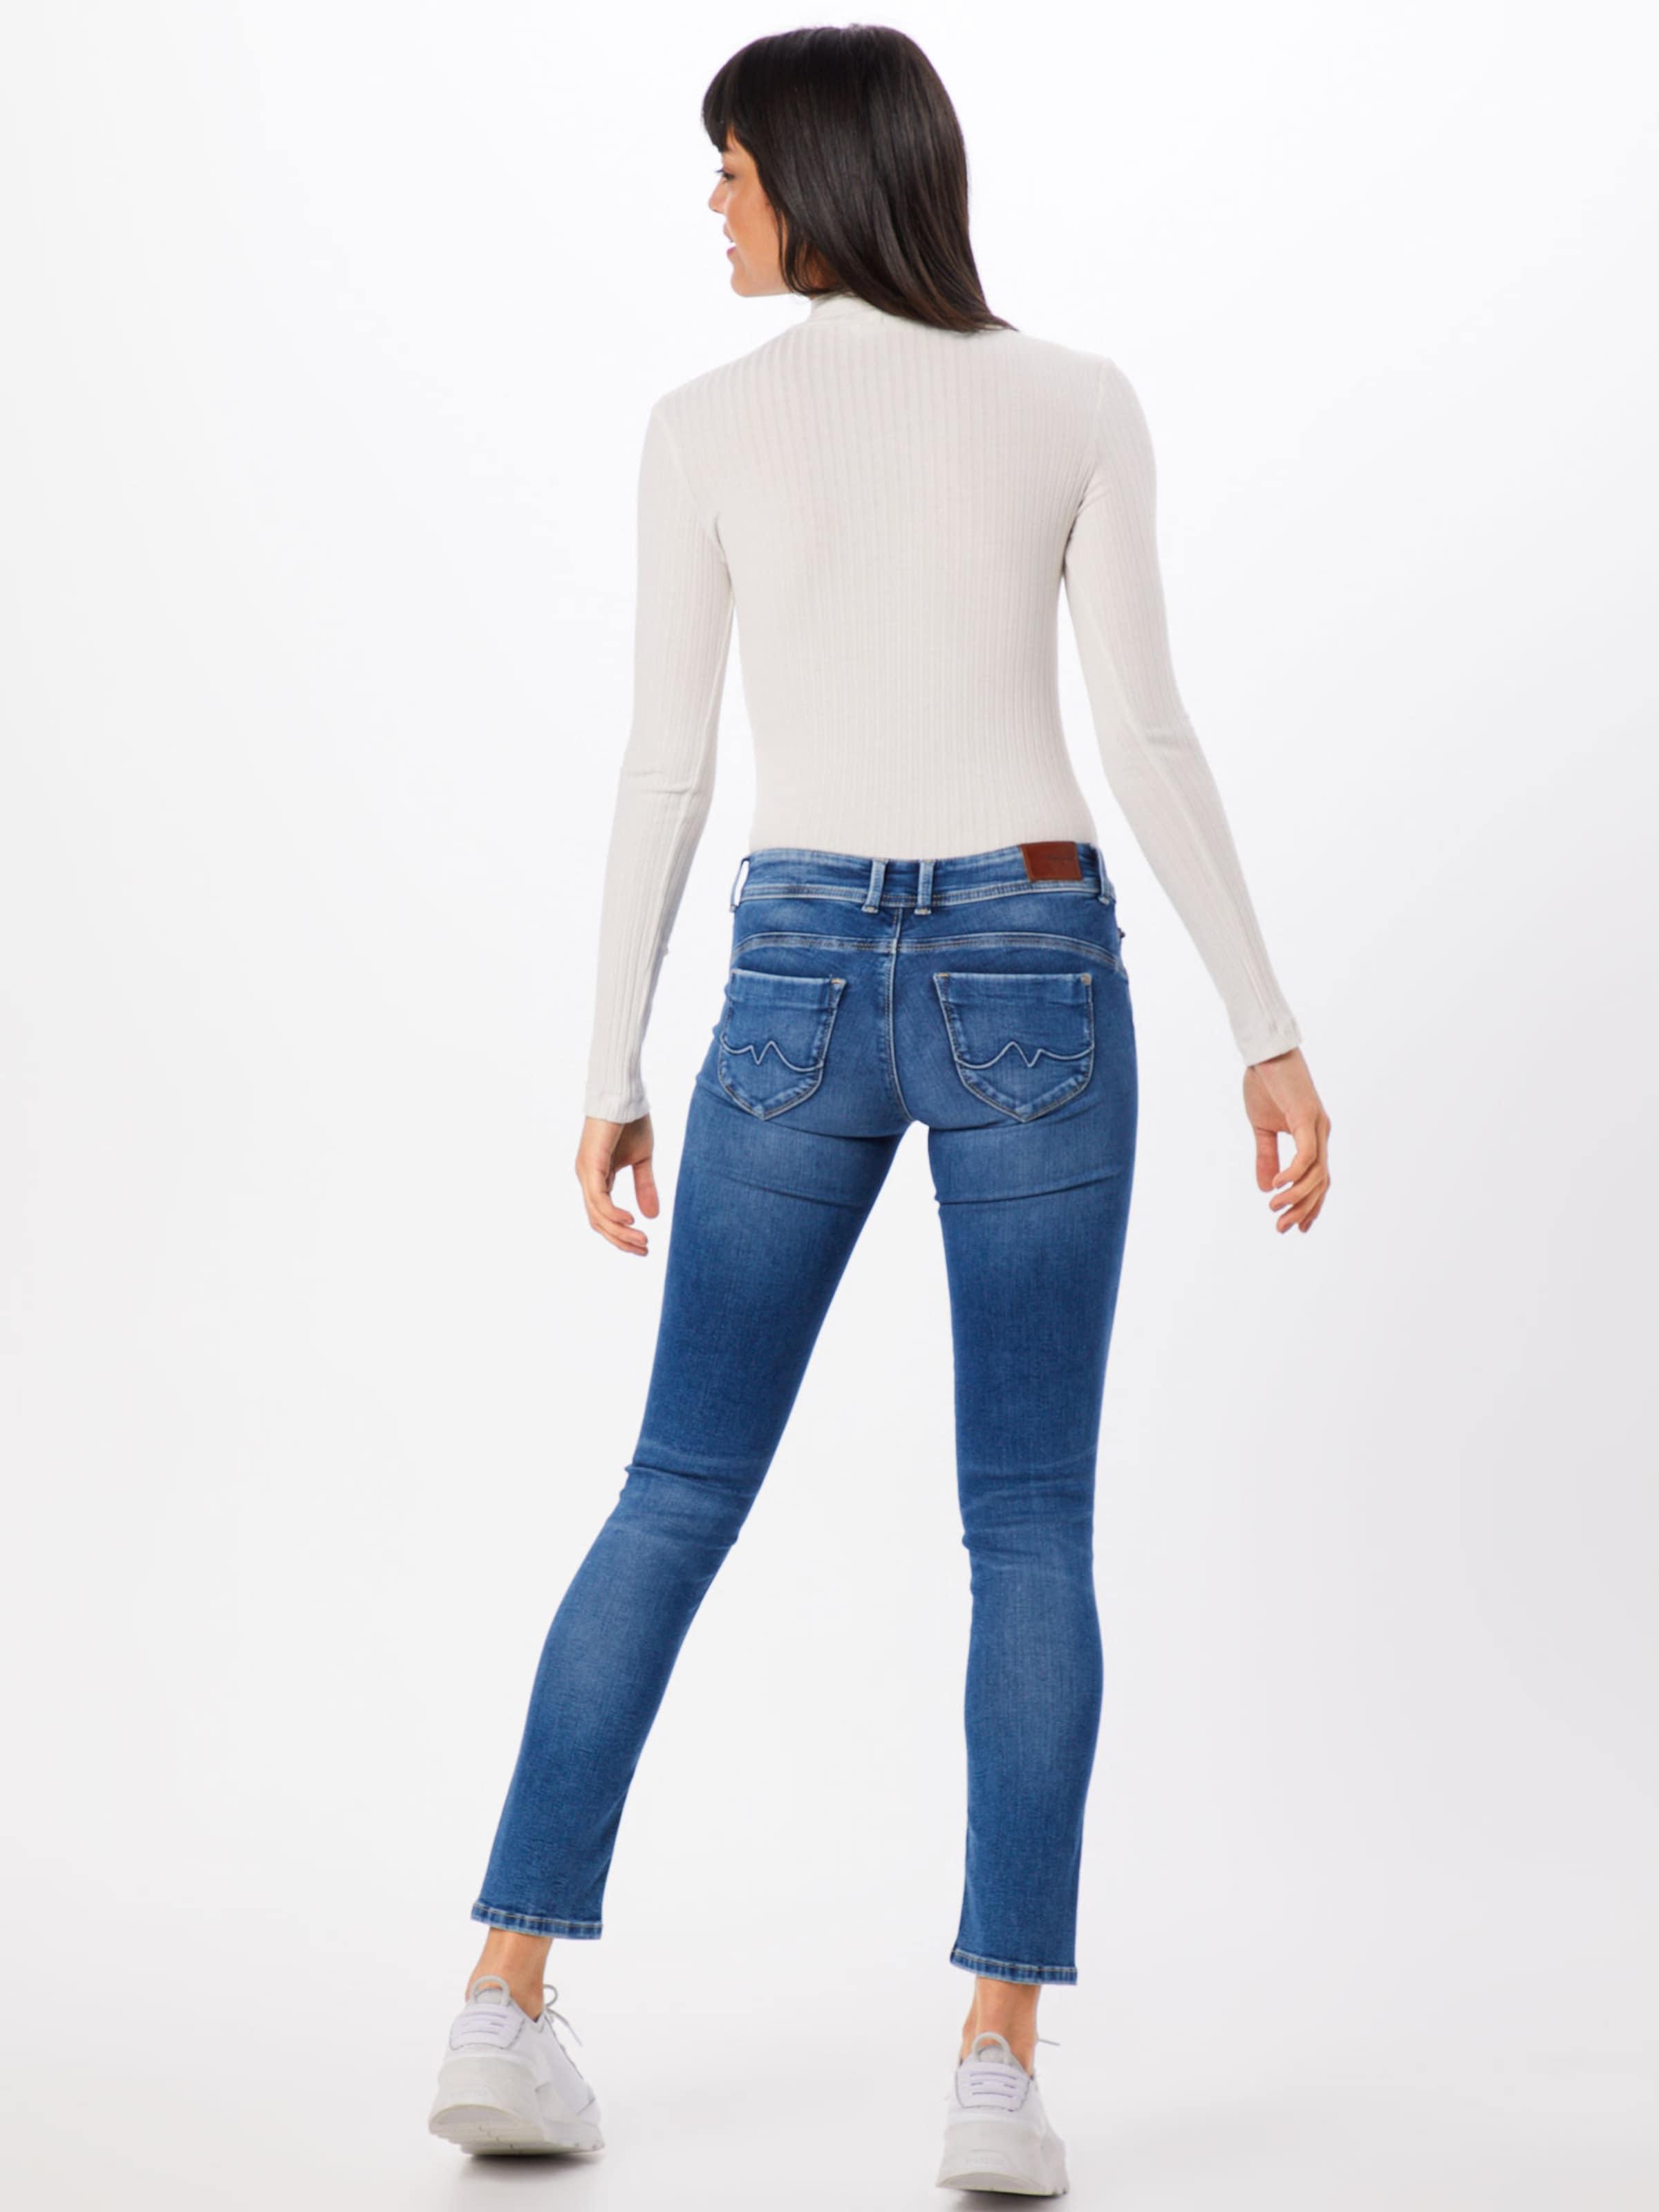 Blue In Pepe 'new Denim Jeans Brooke' mNvn80wO